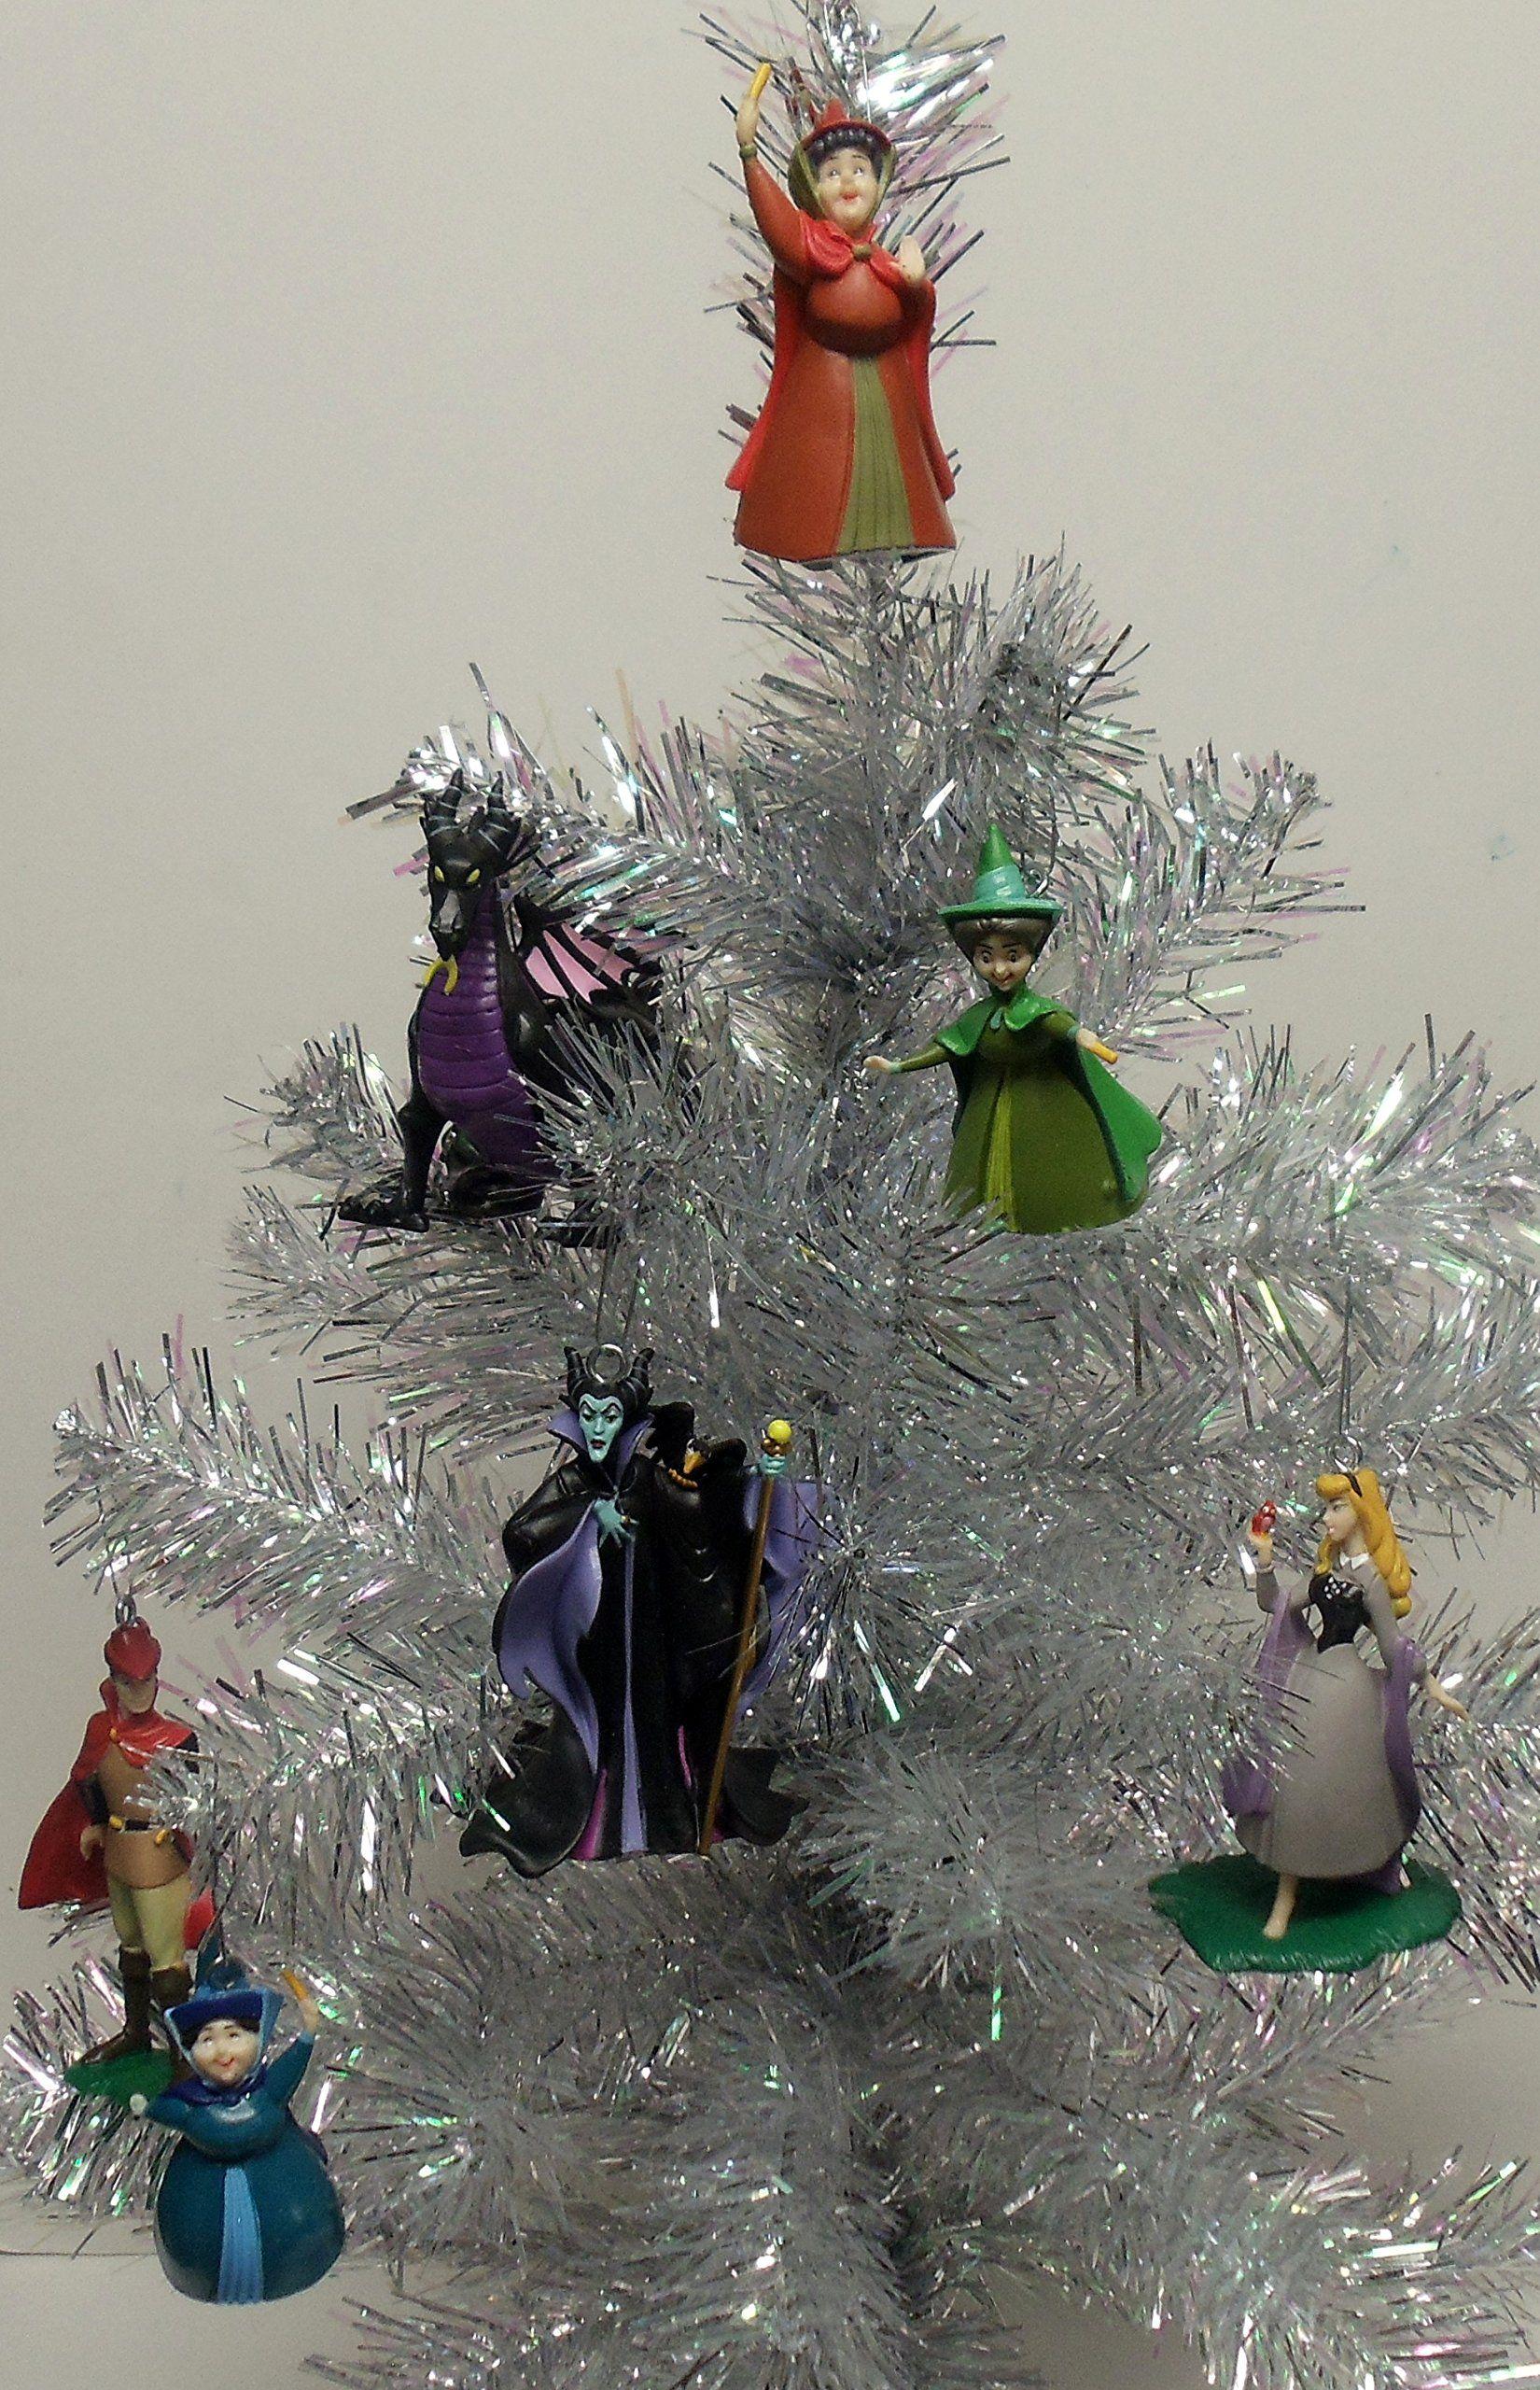 Disney tree ornaments - Amazon Com Disney Sleeping Beauty 7 Piece Holiday Christmas Tree Ornaments Featuring Princess Aurora